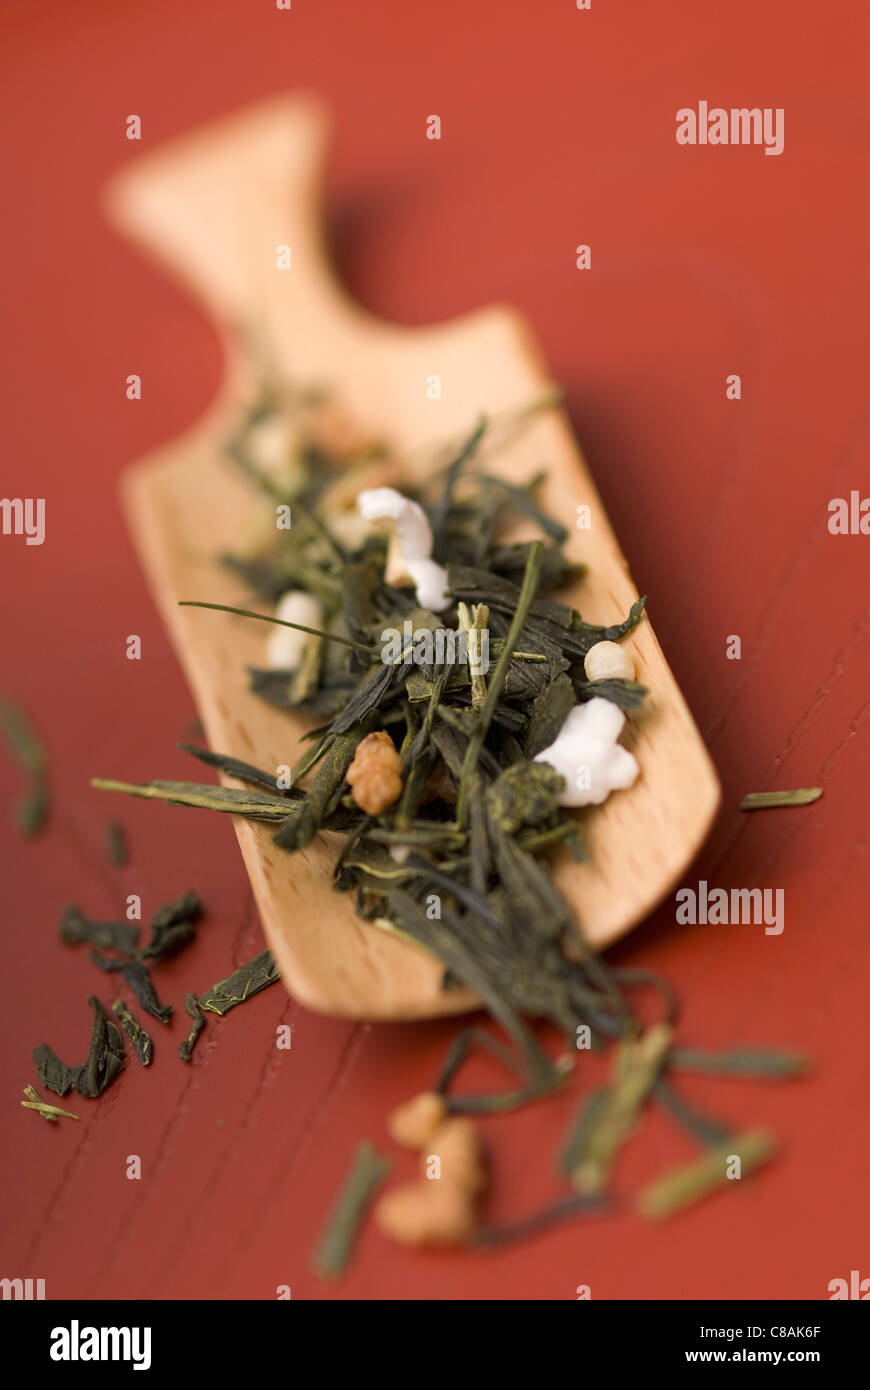 Scoopful of flavored tea - Stock Image